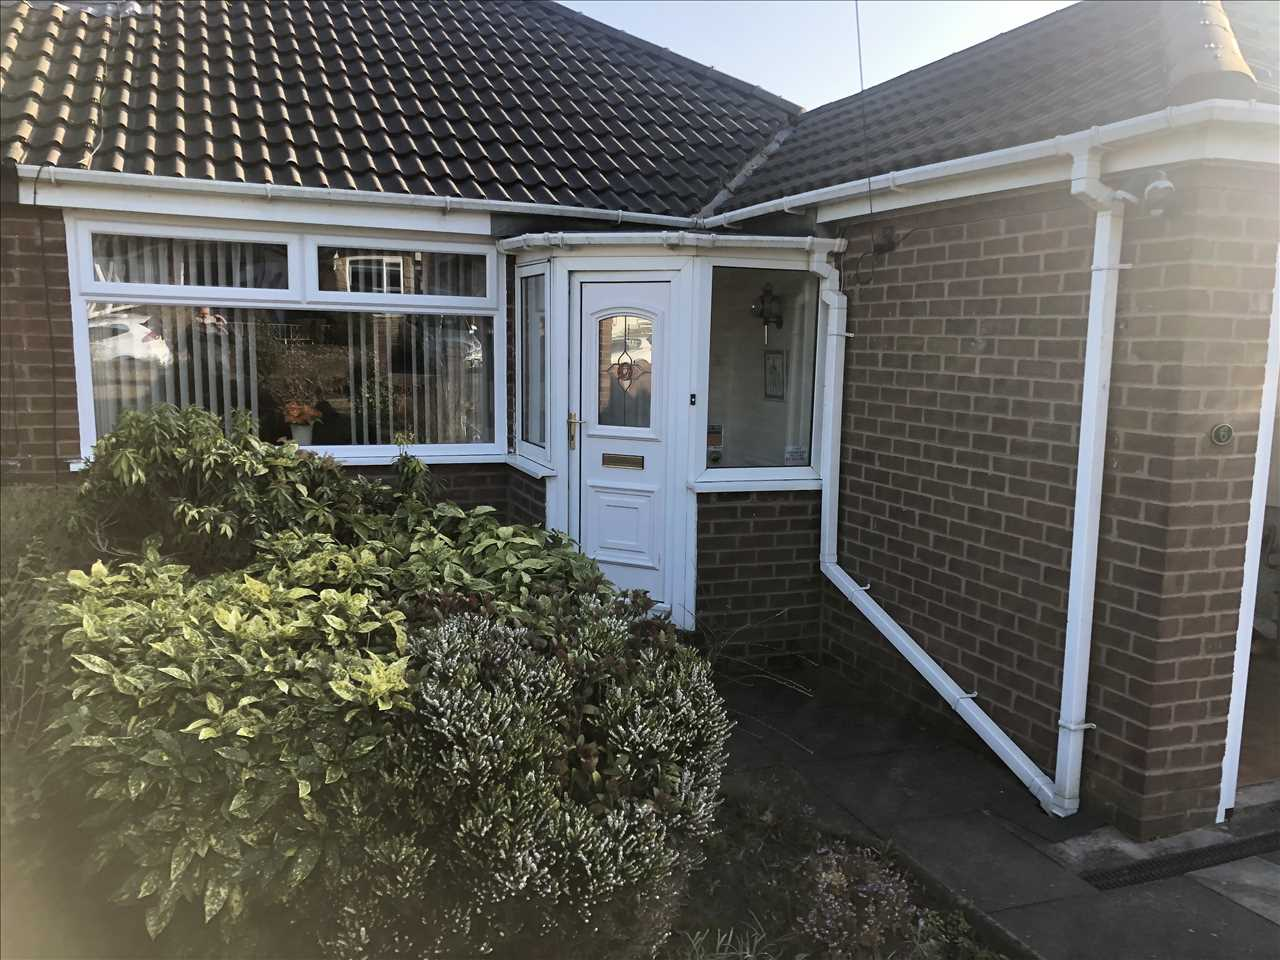 3 bed bungalow for sale in Belmont Road, Adlington, PR6